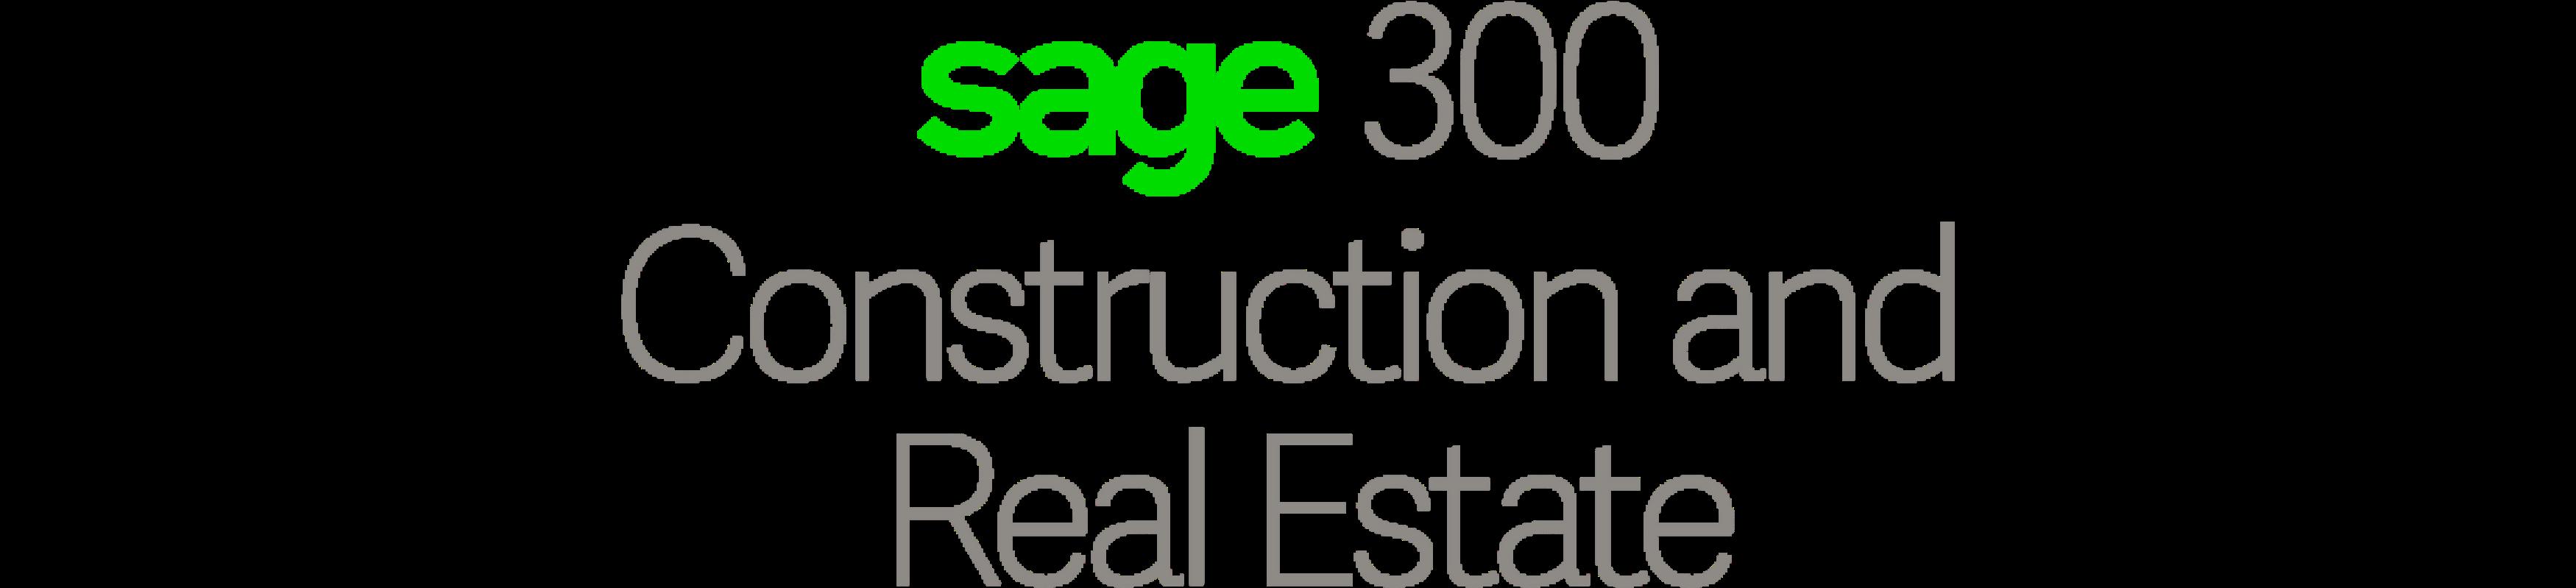 sage-300-CRE-followup-crm-integration